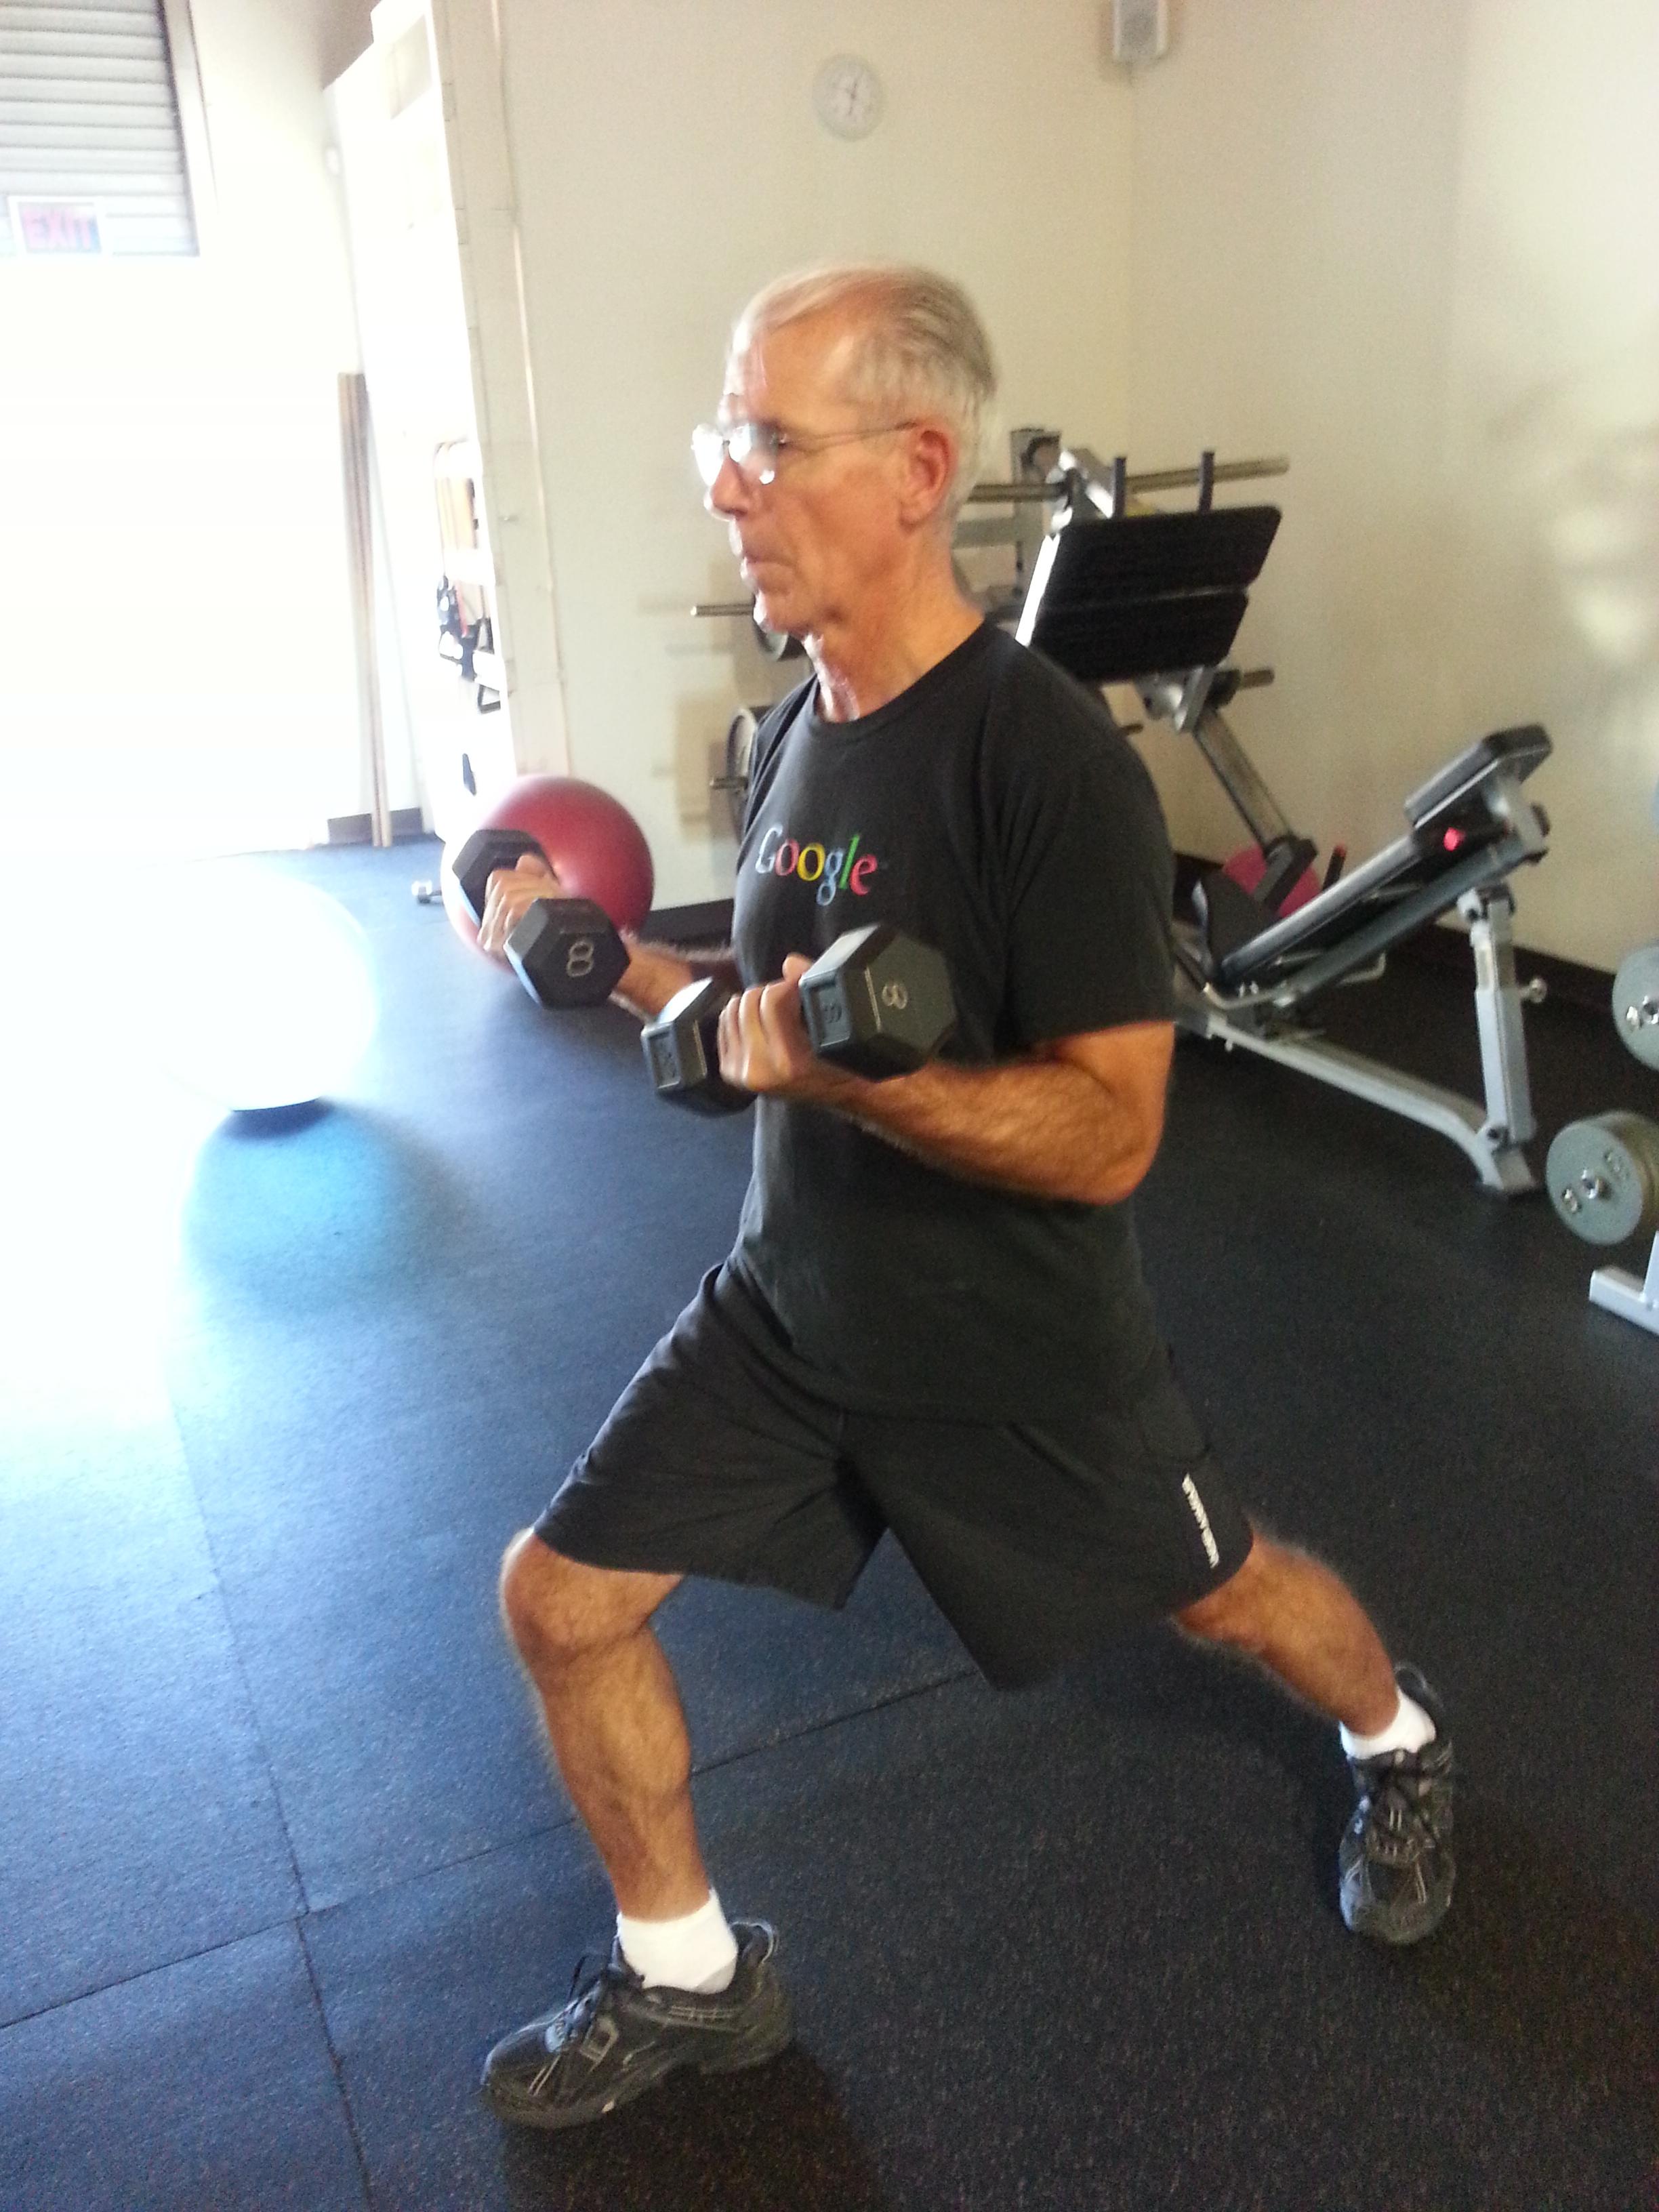 Weight lifting at work